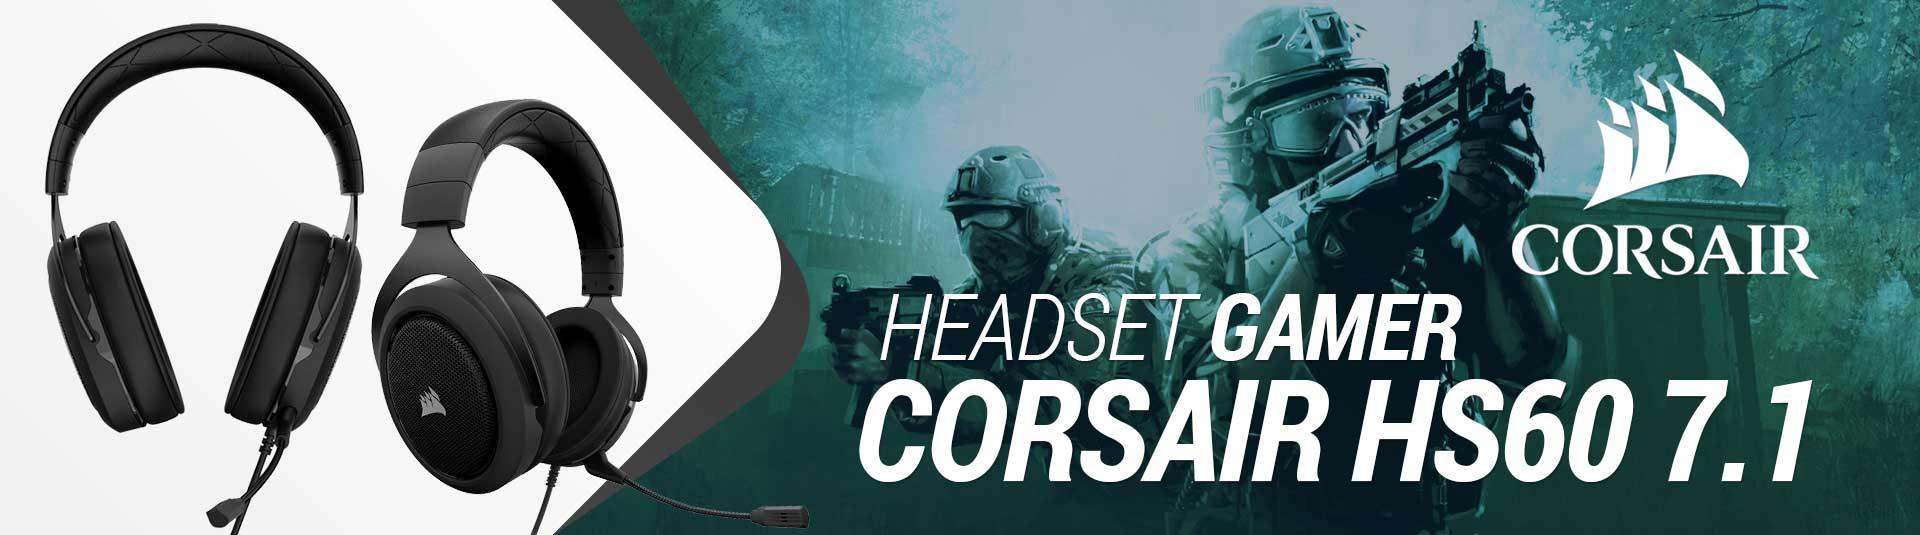 Headset Gamer Corsair HS60 7.1